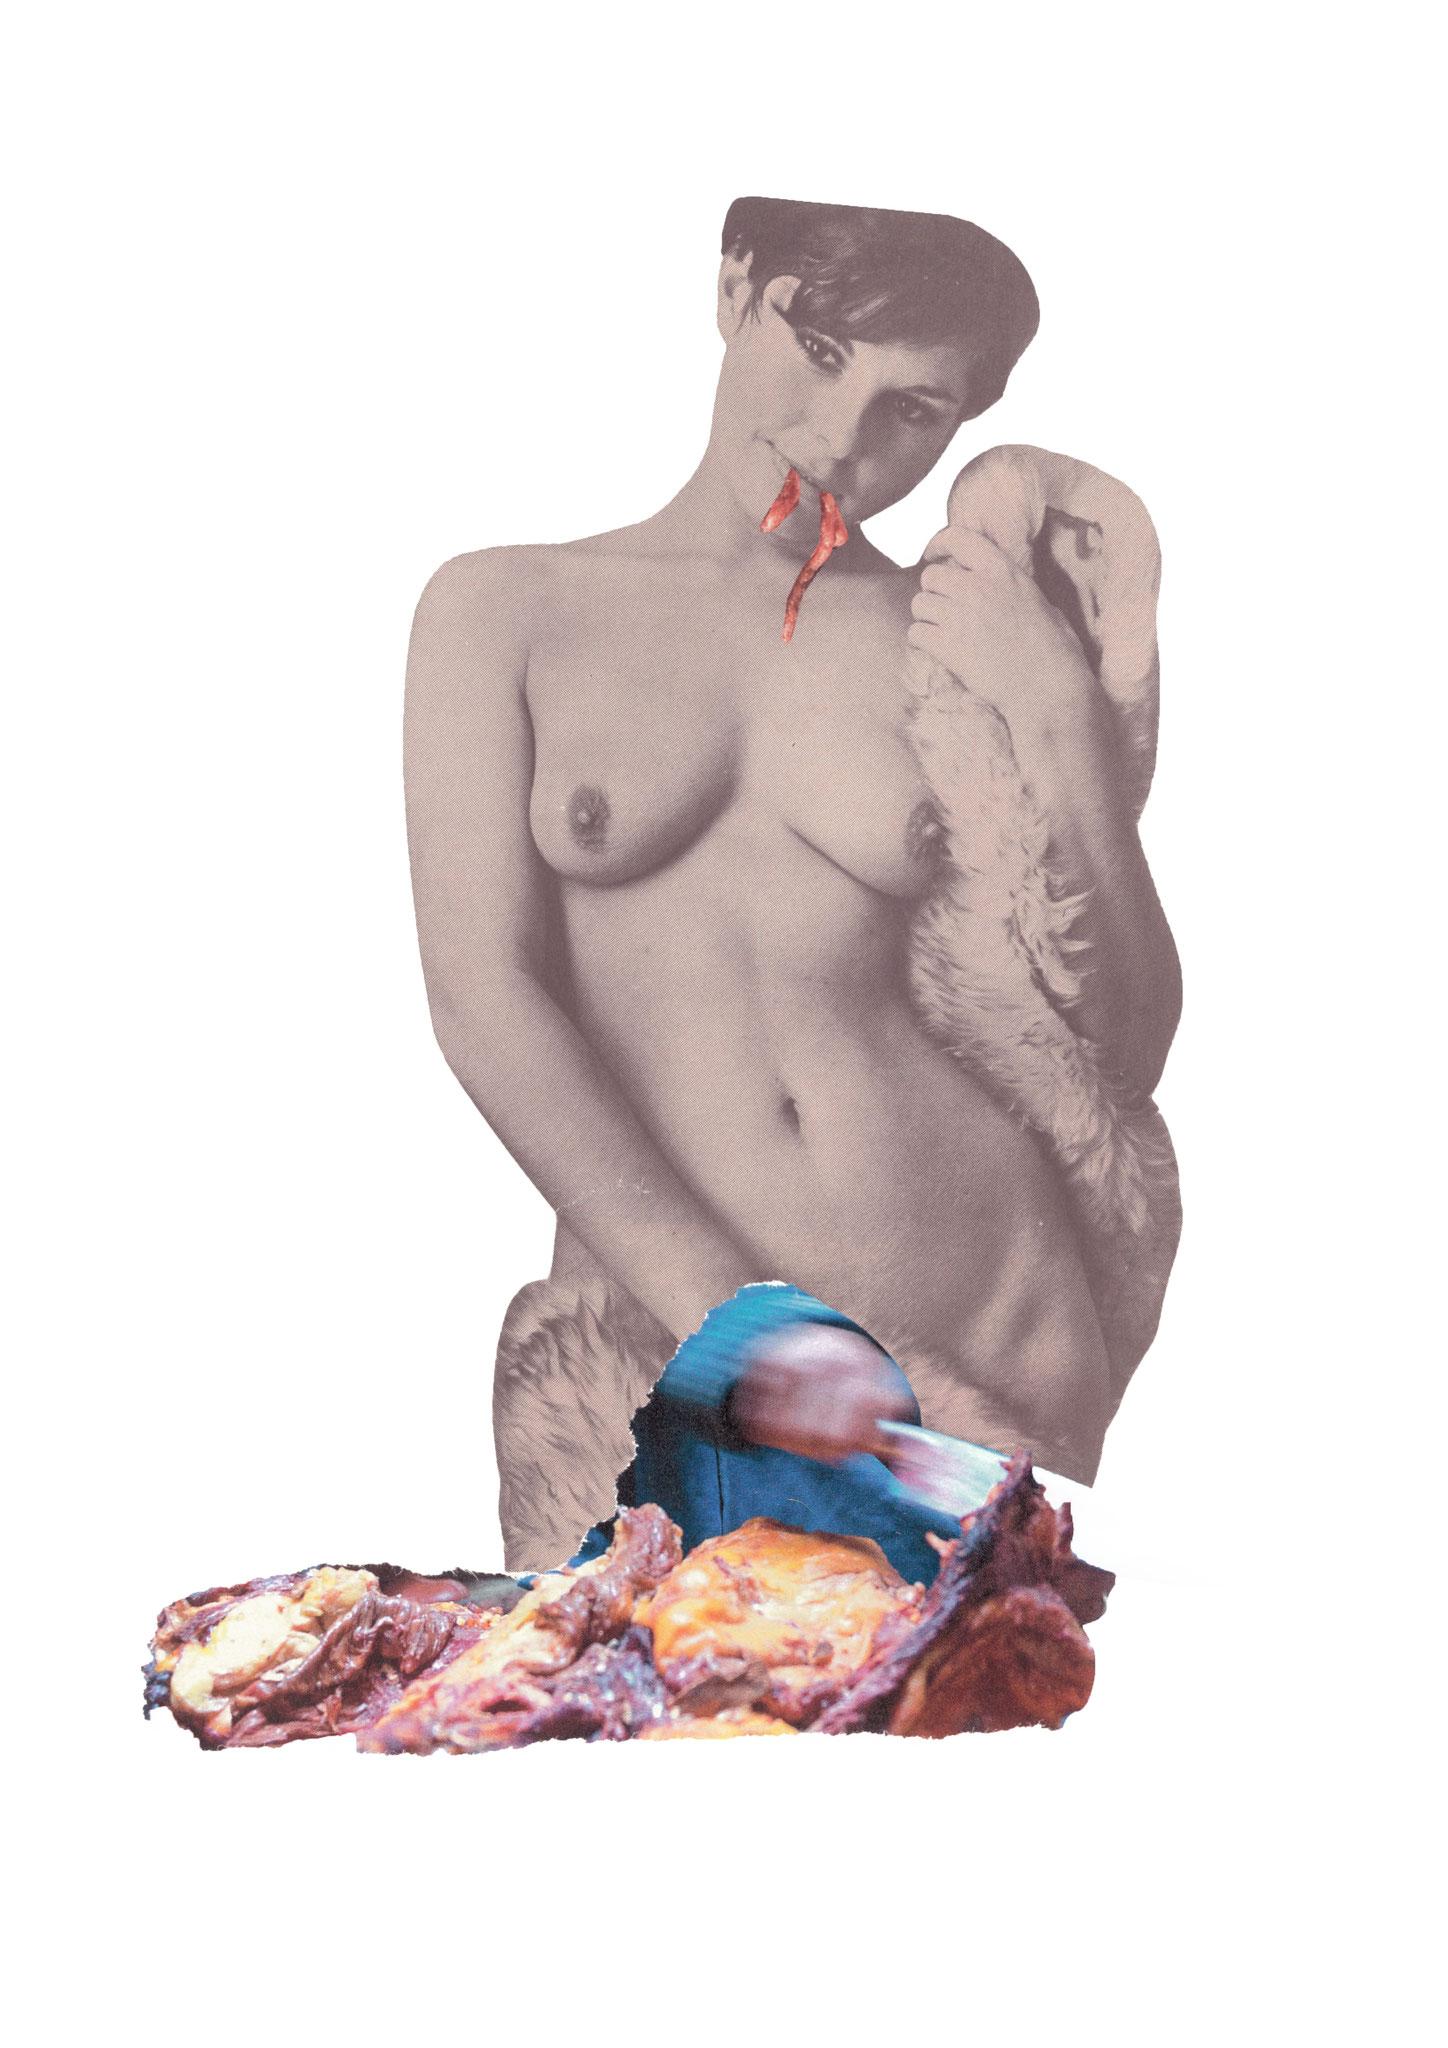 Venus in furs, 21x30cm, 2017